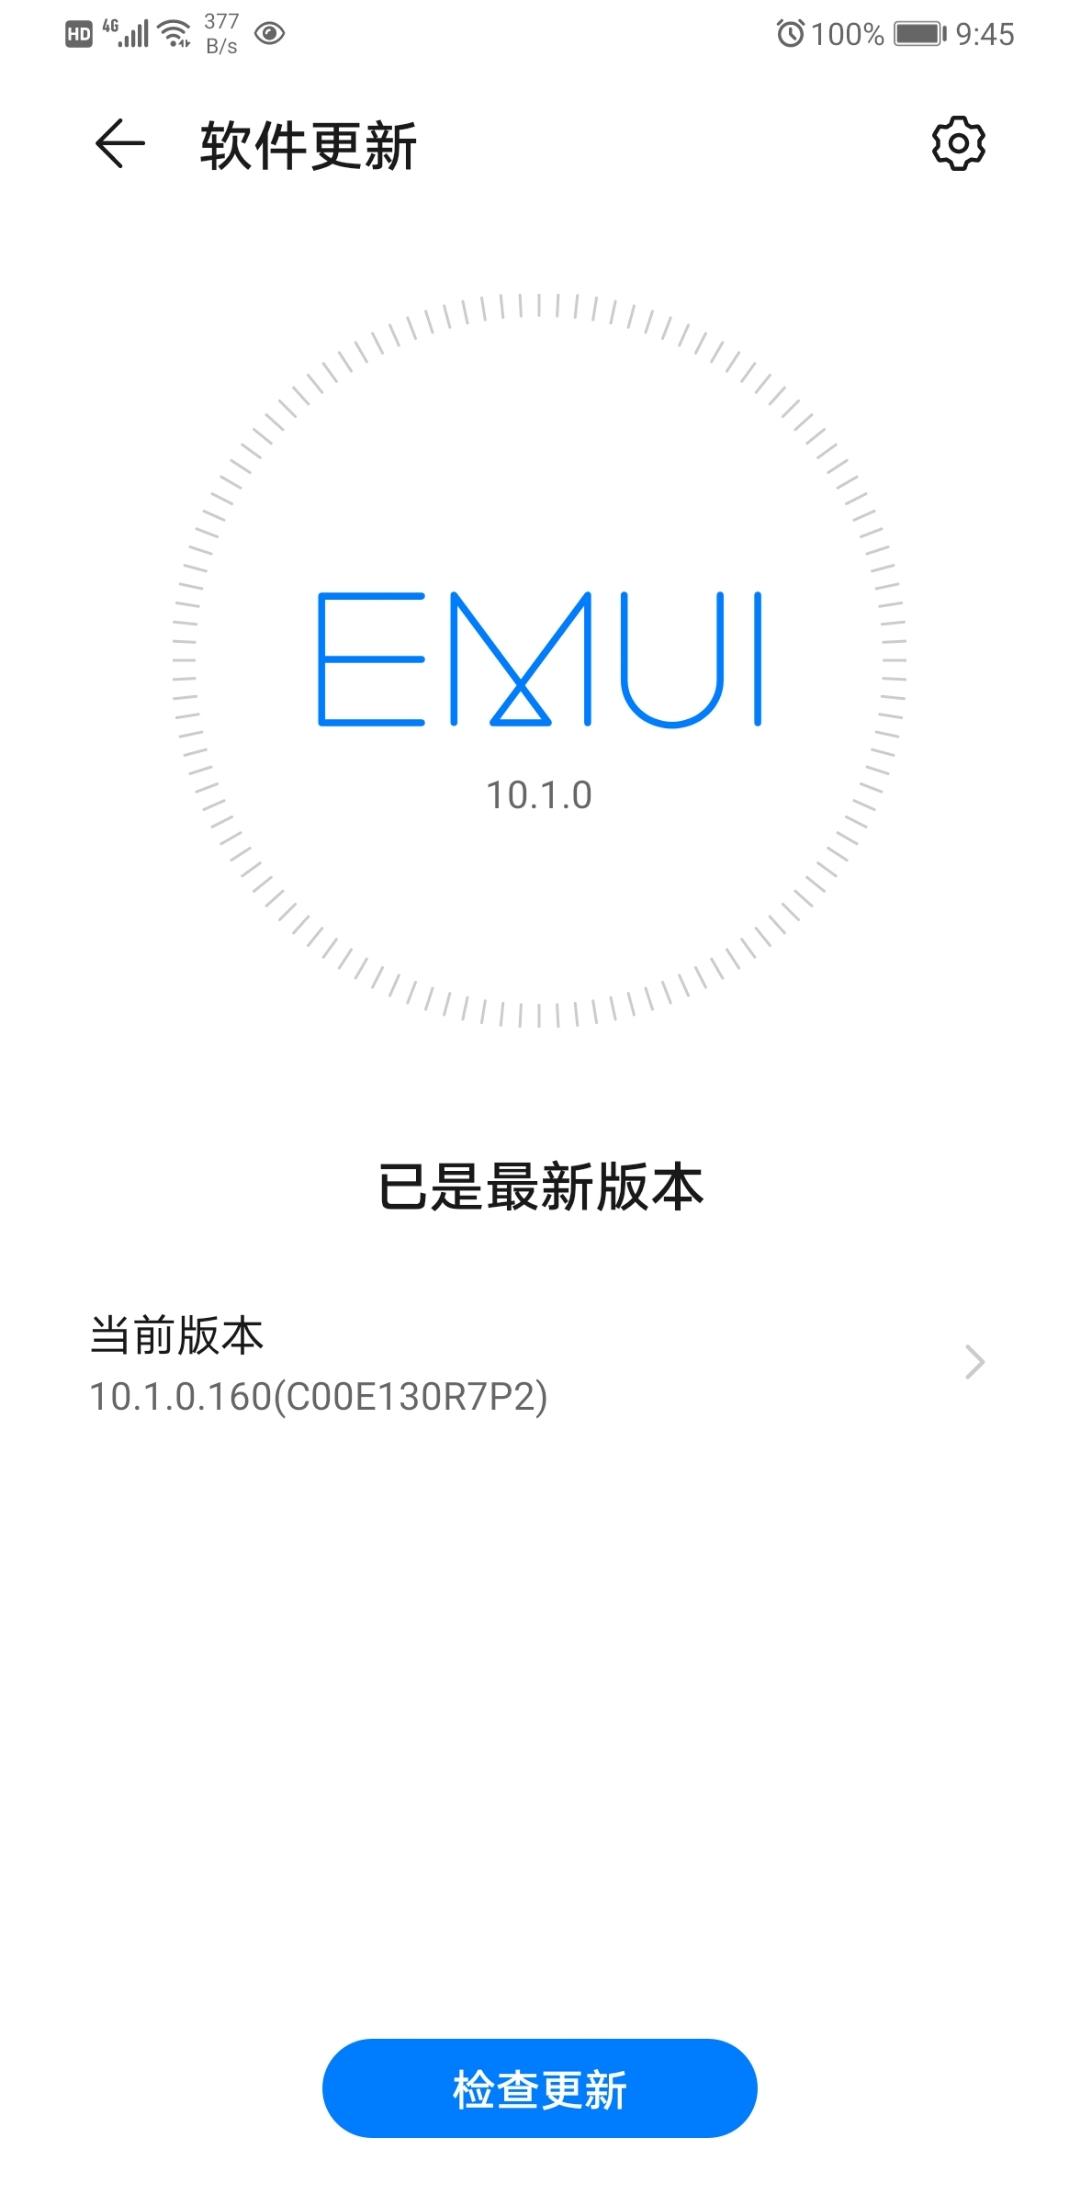 Screenshot_20201205_214522_com.huawei.android.hwouc.jpg